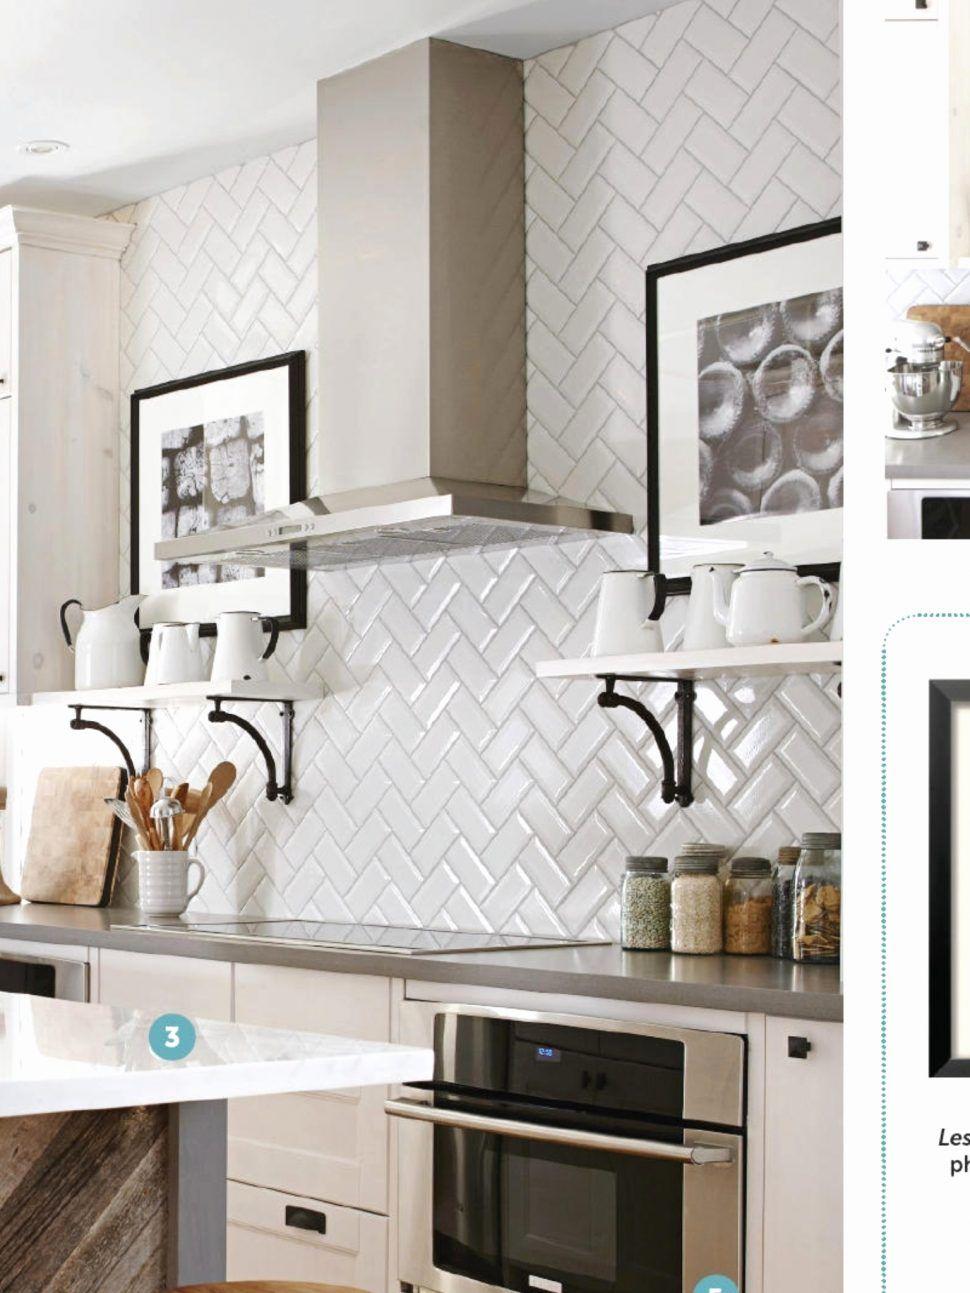 Kitchen Backsplash Cool Small Living Room Room Wall Tiles Design